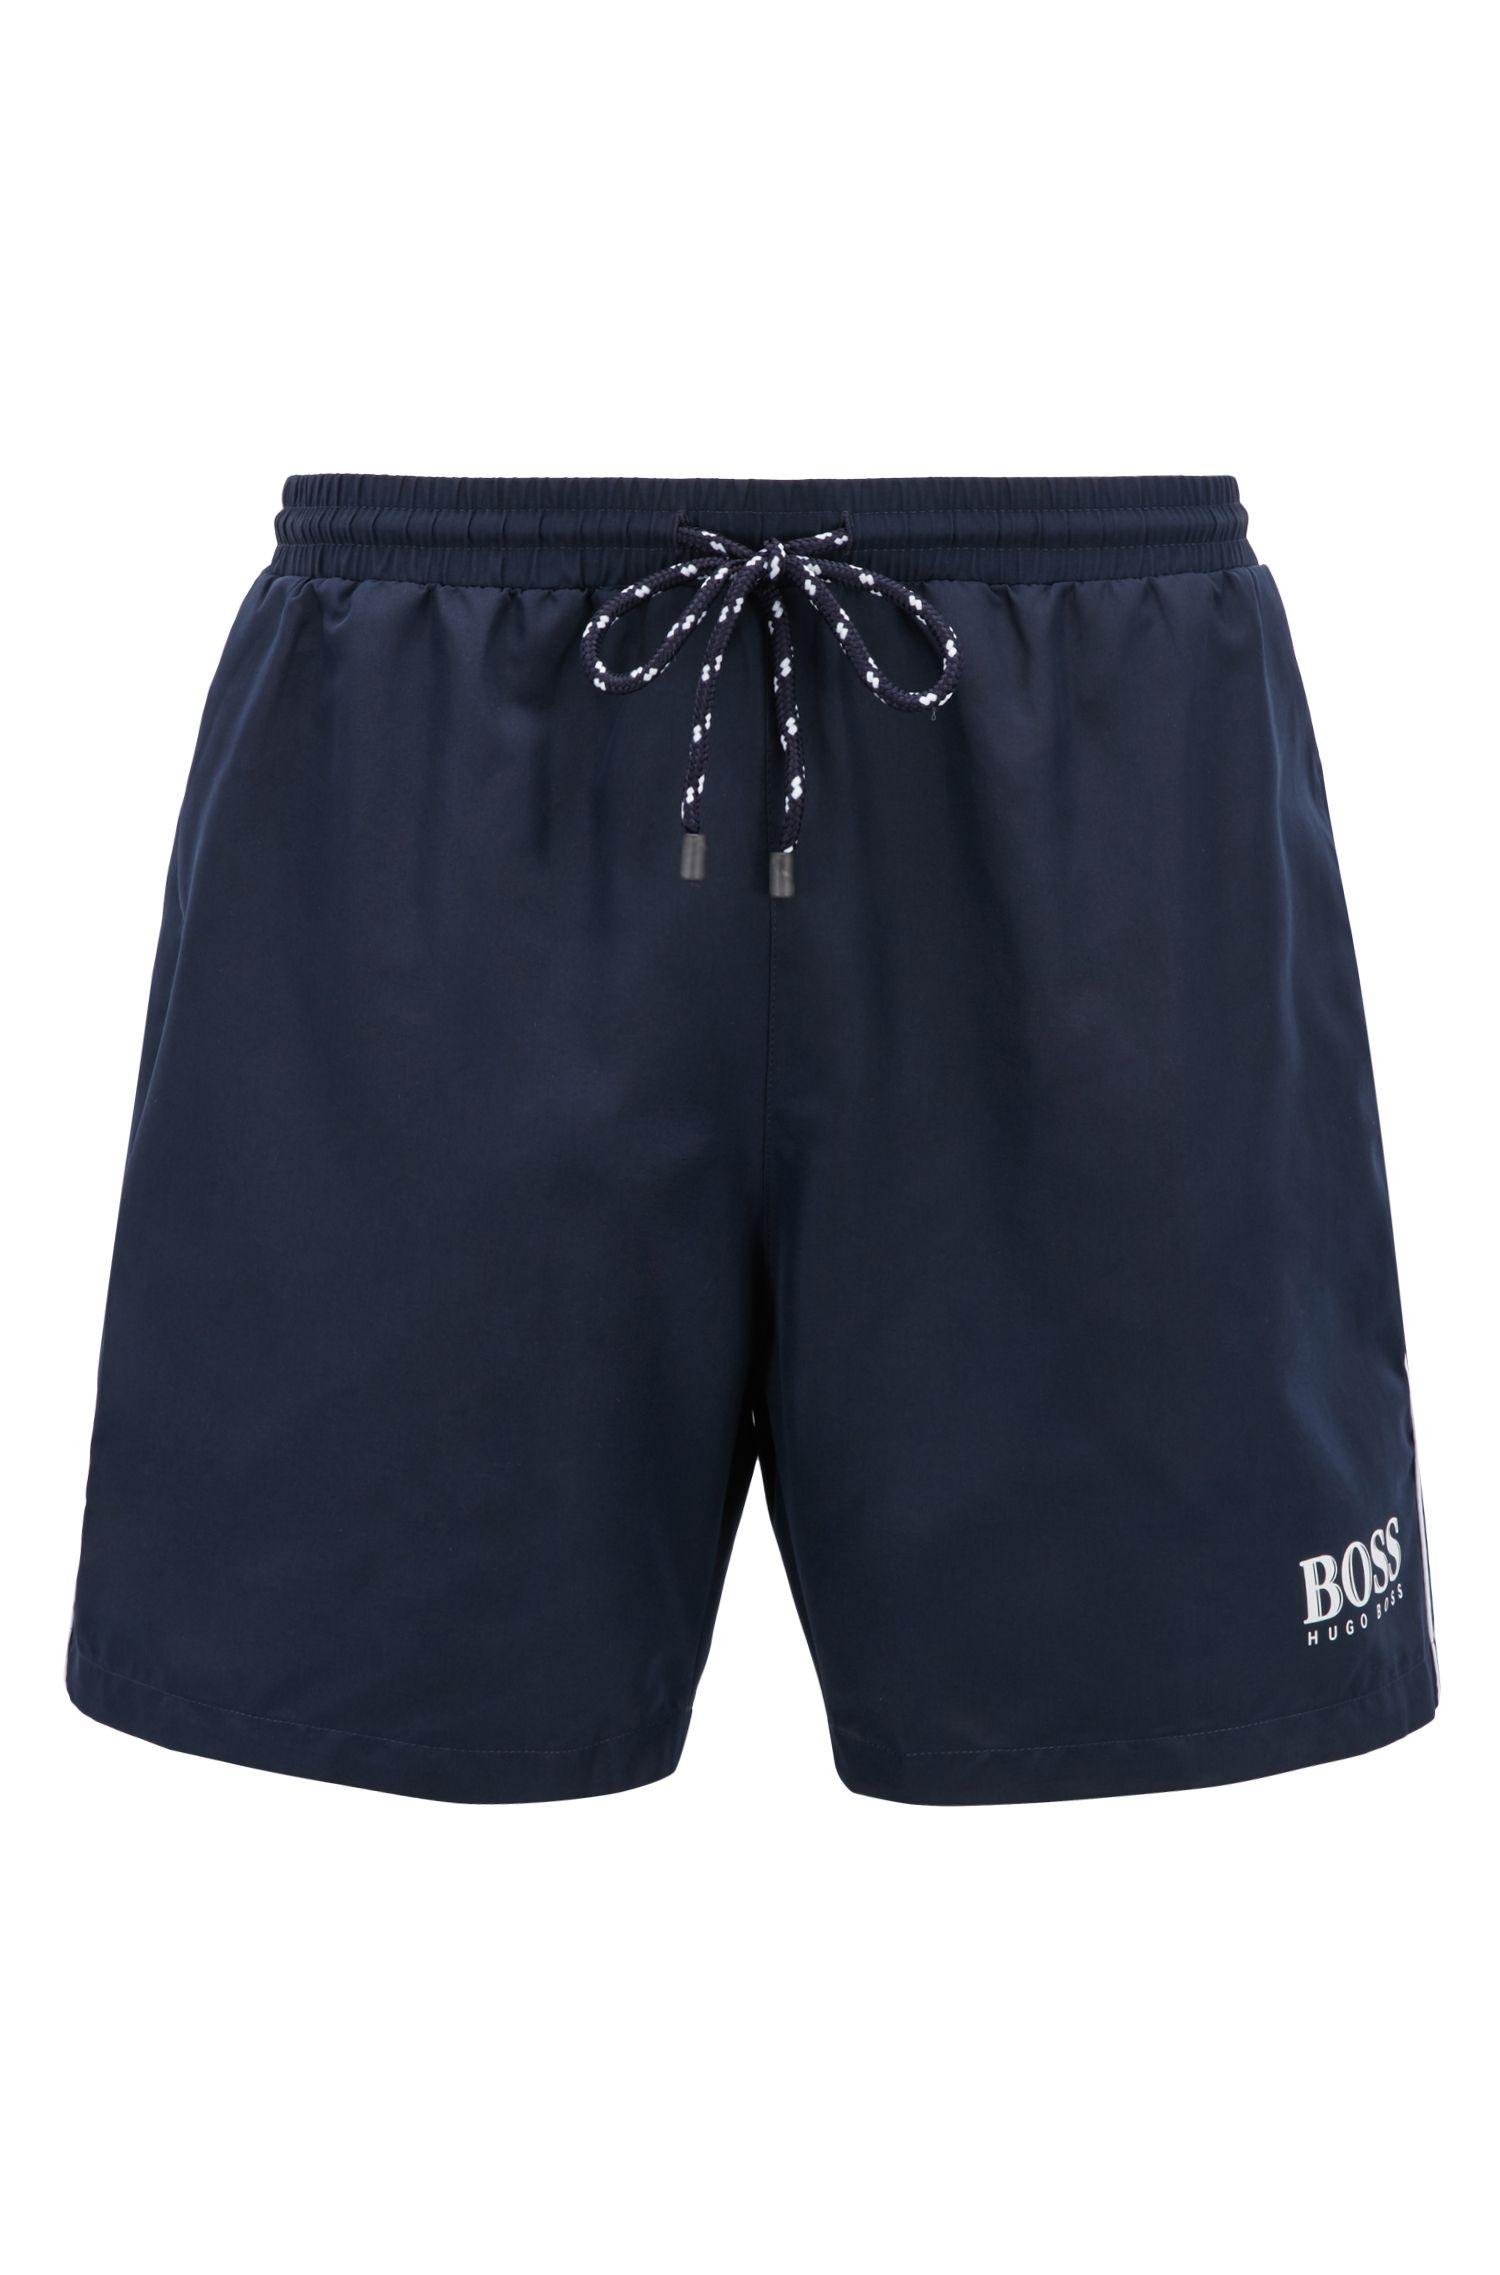 'Starfish BM' | Quick Dry Swim Trunks, Dark Blue